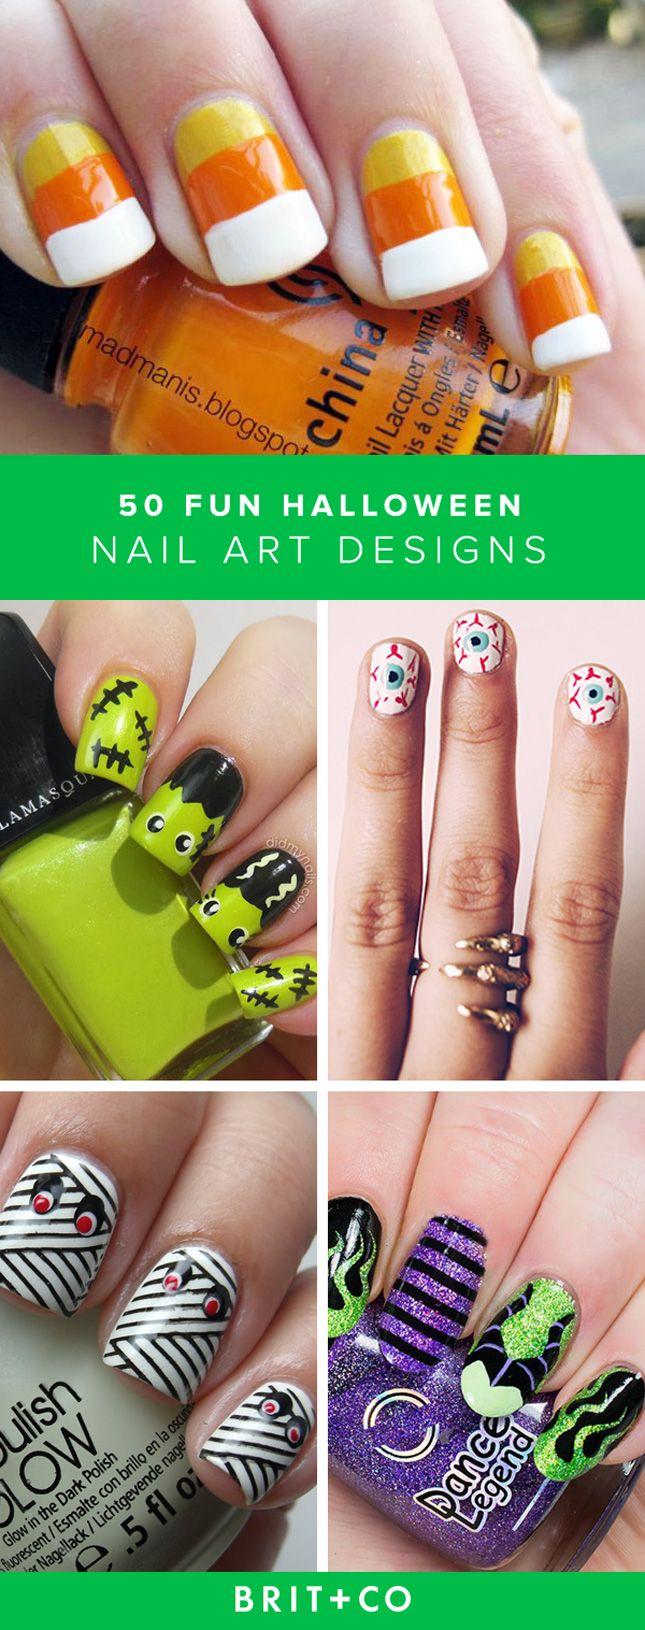 65 Amazing + Creative Halloween Nail Art Designs | Halloween ...